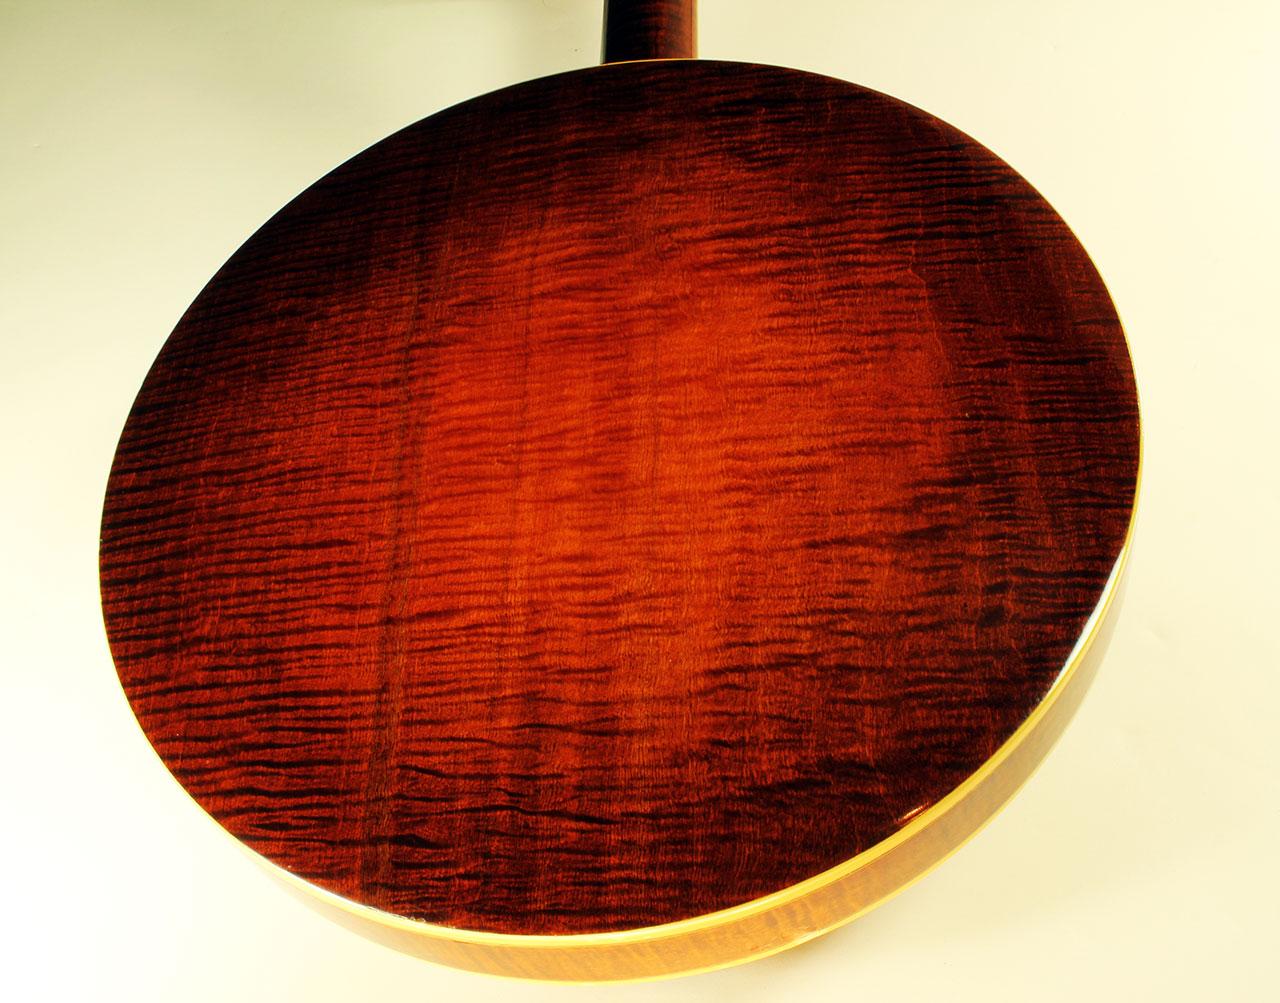 Gibson_mastertone_banjo_clone_resonator_1